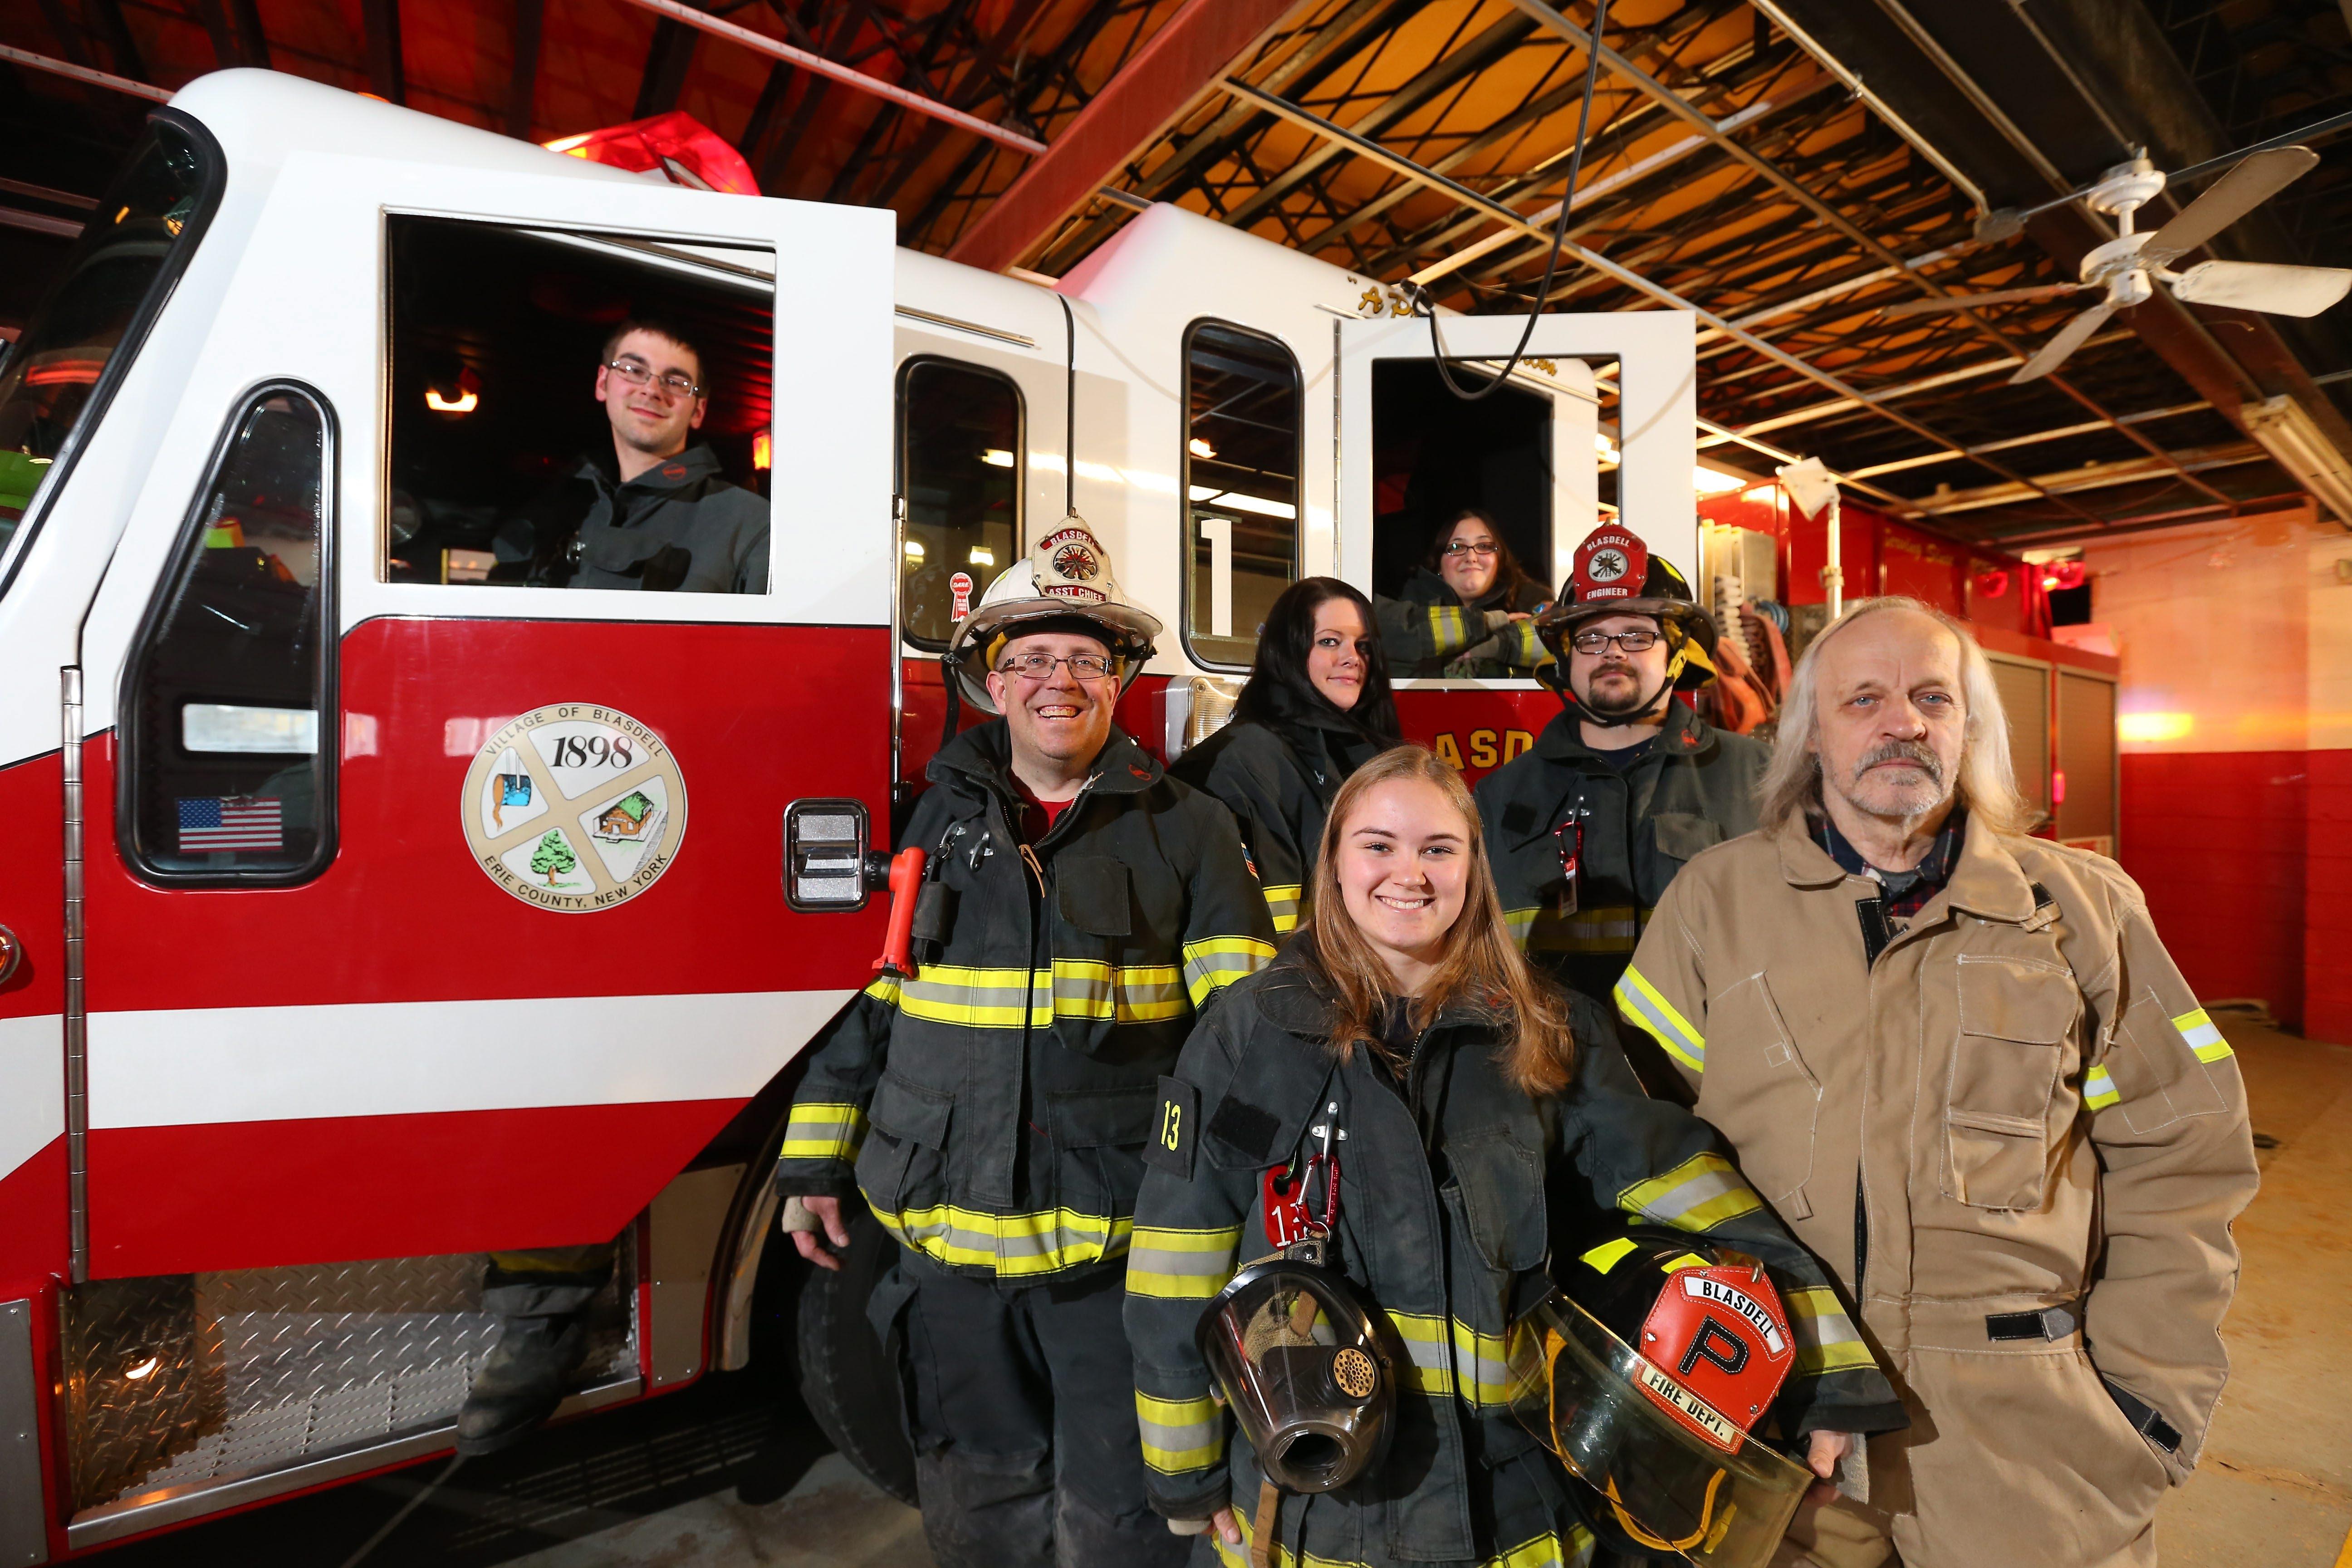 Blasdell volunteer firefighters, from left : Erik Kobel, Greg Stoklosa, Renee Murray, Elenor Murcko, Loretta Fusco, Matthew Tremblay and Michael Paulick are ready for the open house.